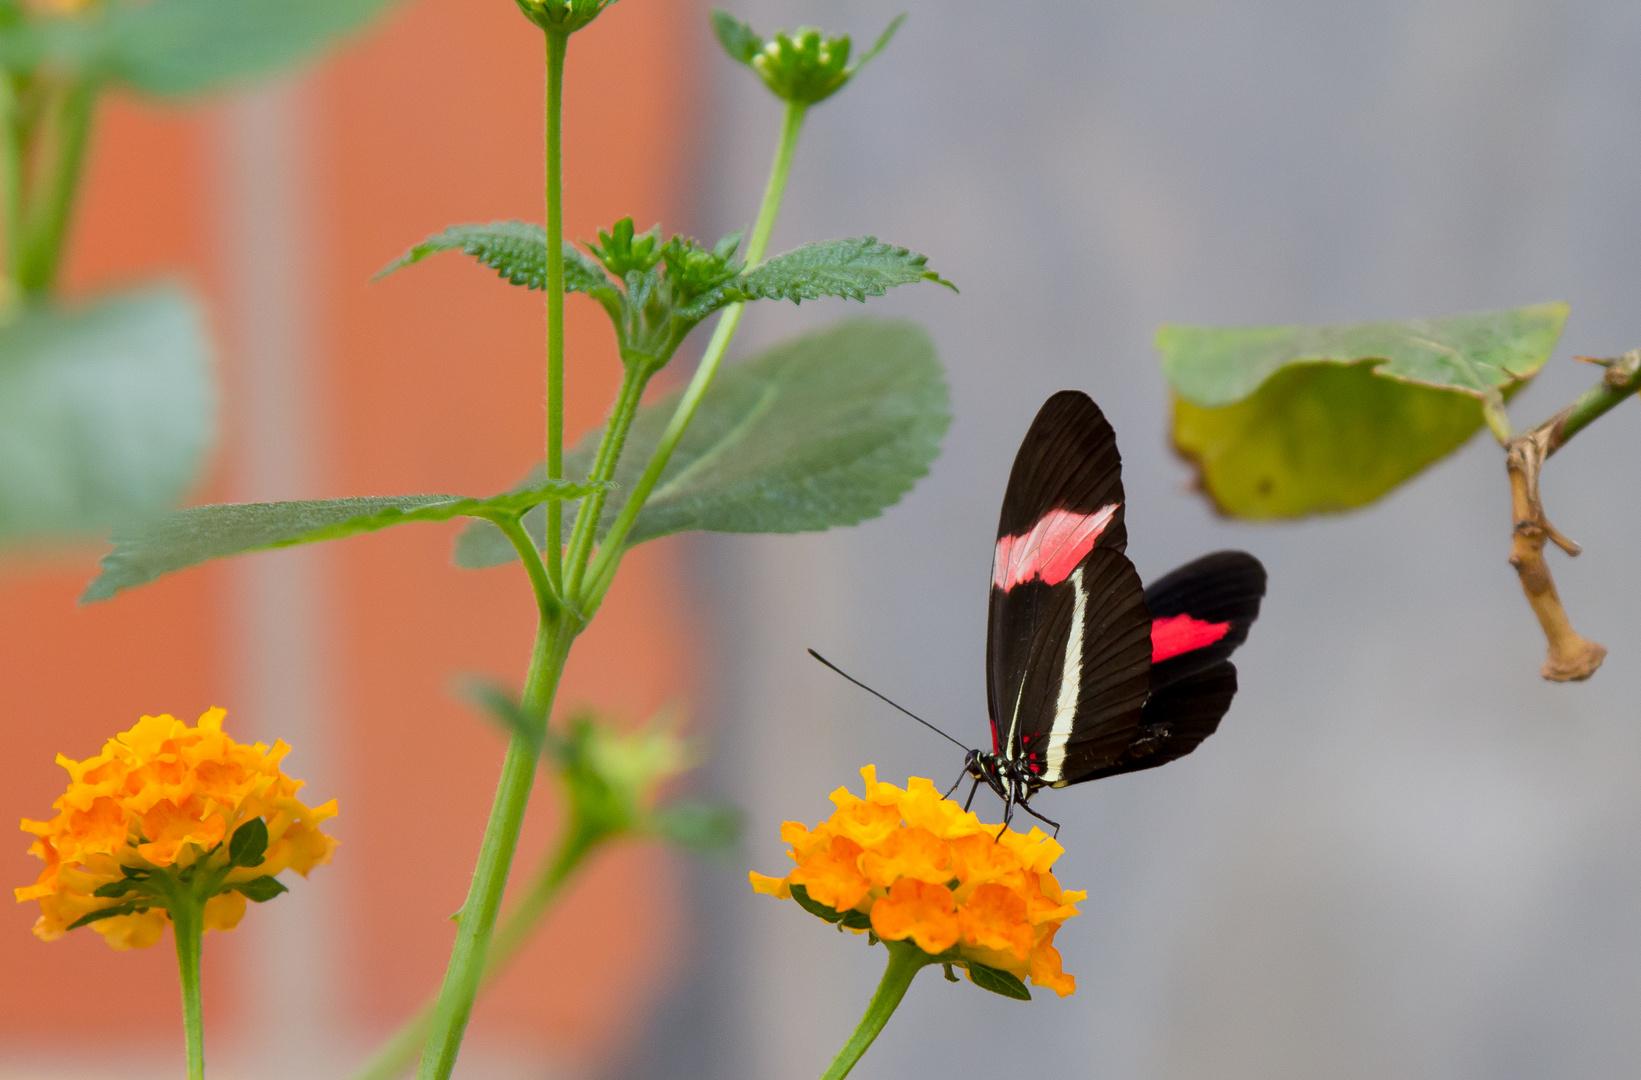 Schmetterlings-Park auf Fehmarn #9